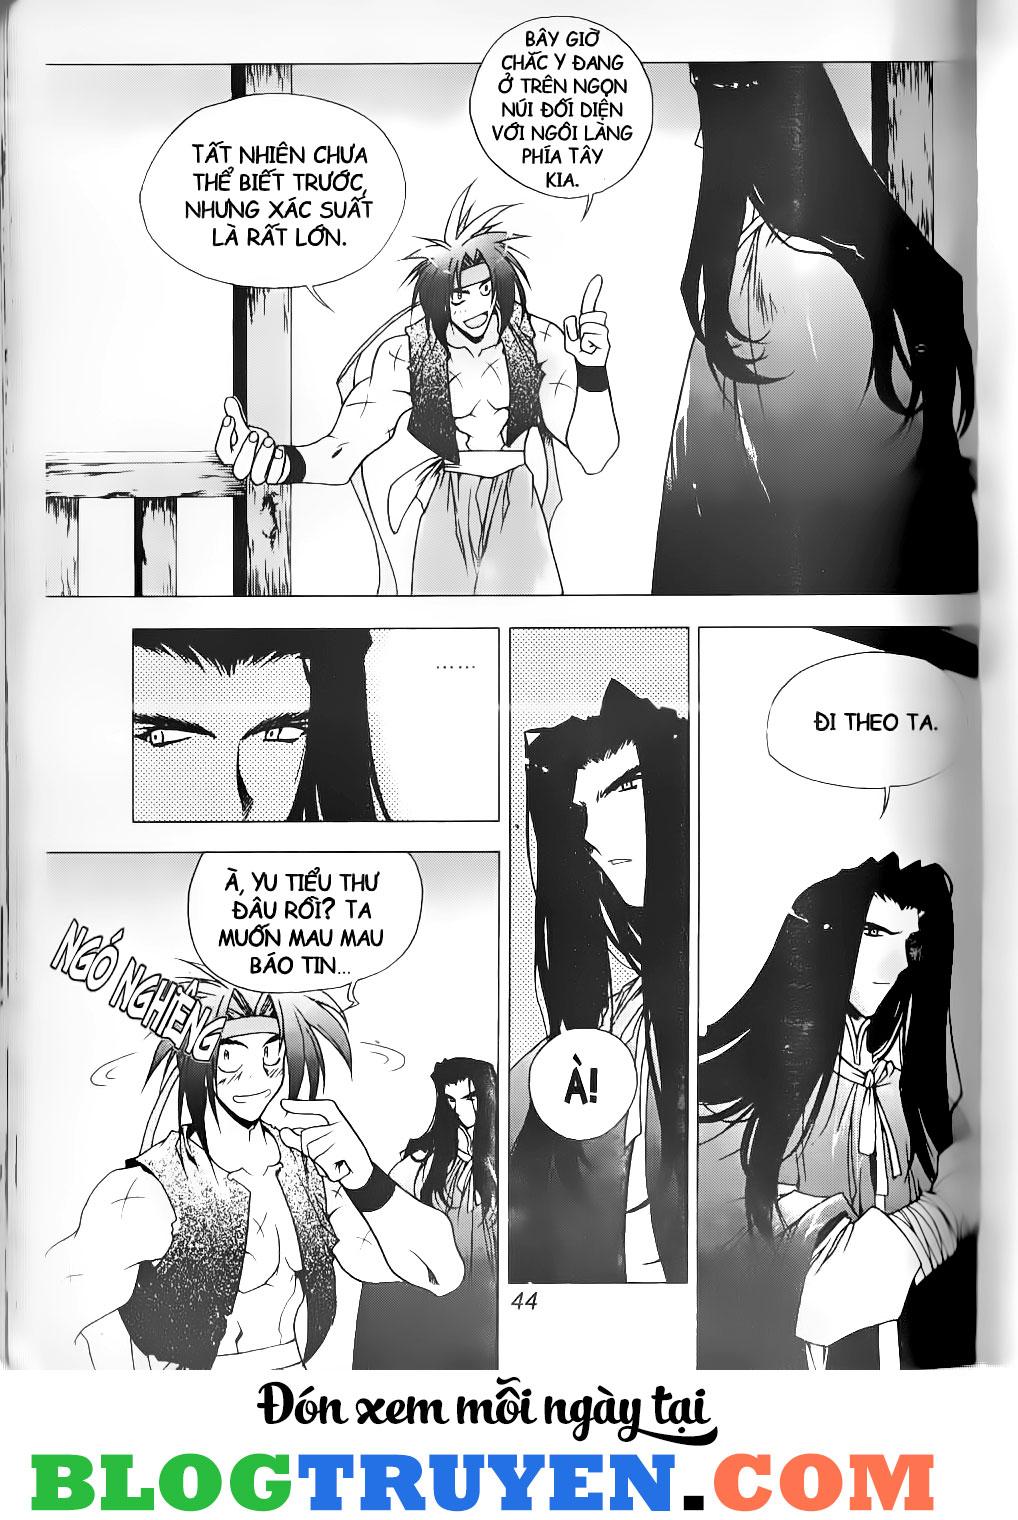 Thiên Lang Liệt Truyện Scan Chap 54 - Truyen.Chap.VN